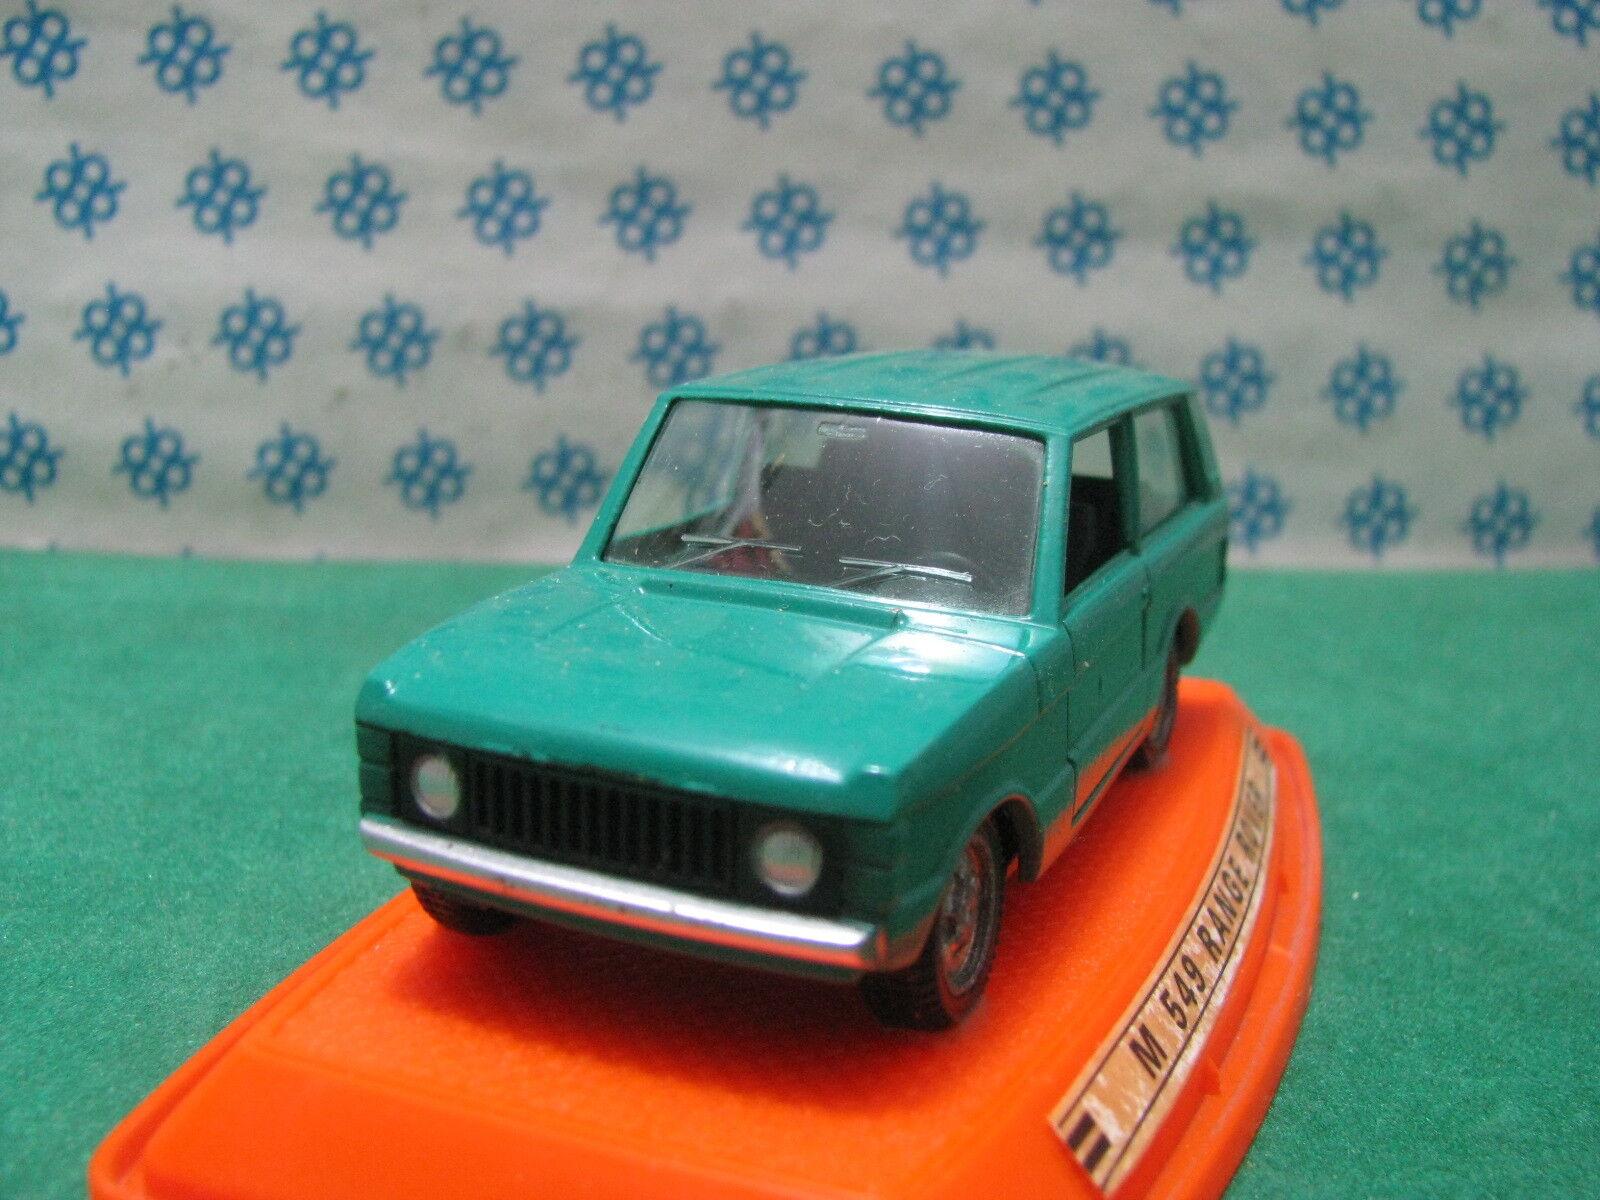 Vintage  -   RANGE  ROVER     -  1 43  Auto-Pilen   M 549   Mint in Box